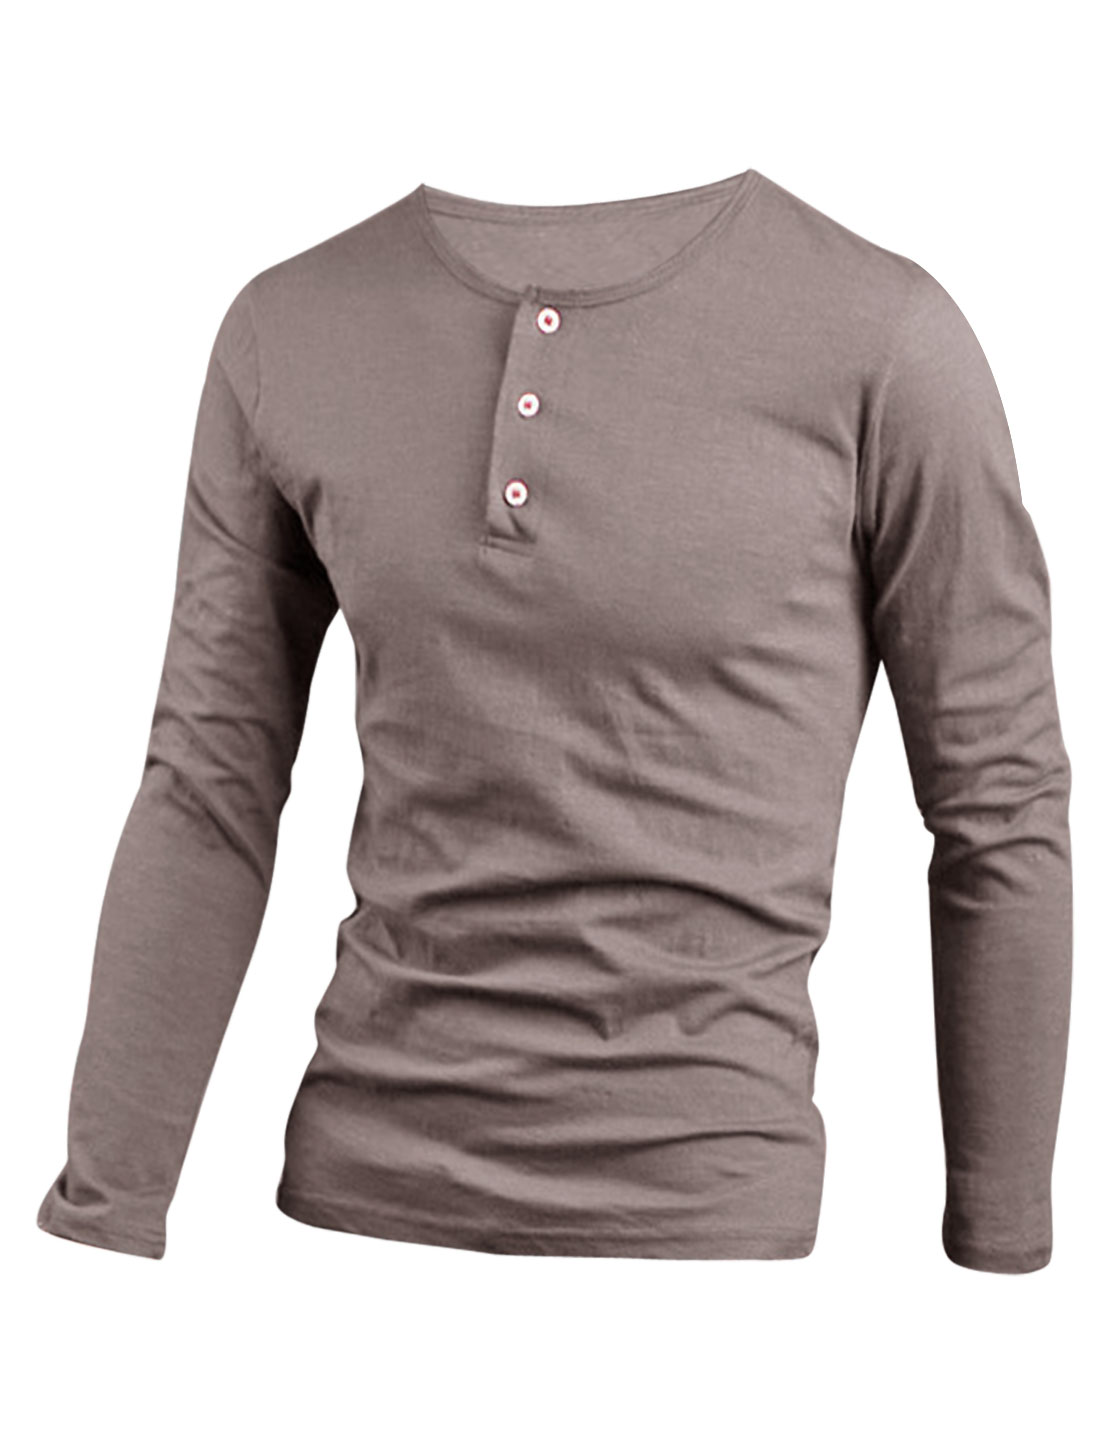 Men Stretch Three Buttons Closed Round Neck Henley Shirt Khaki M